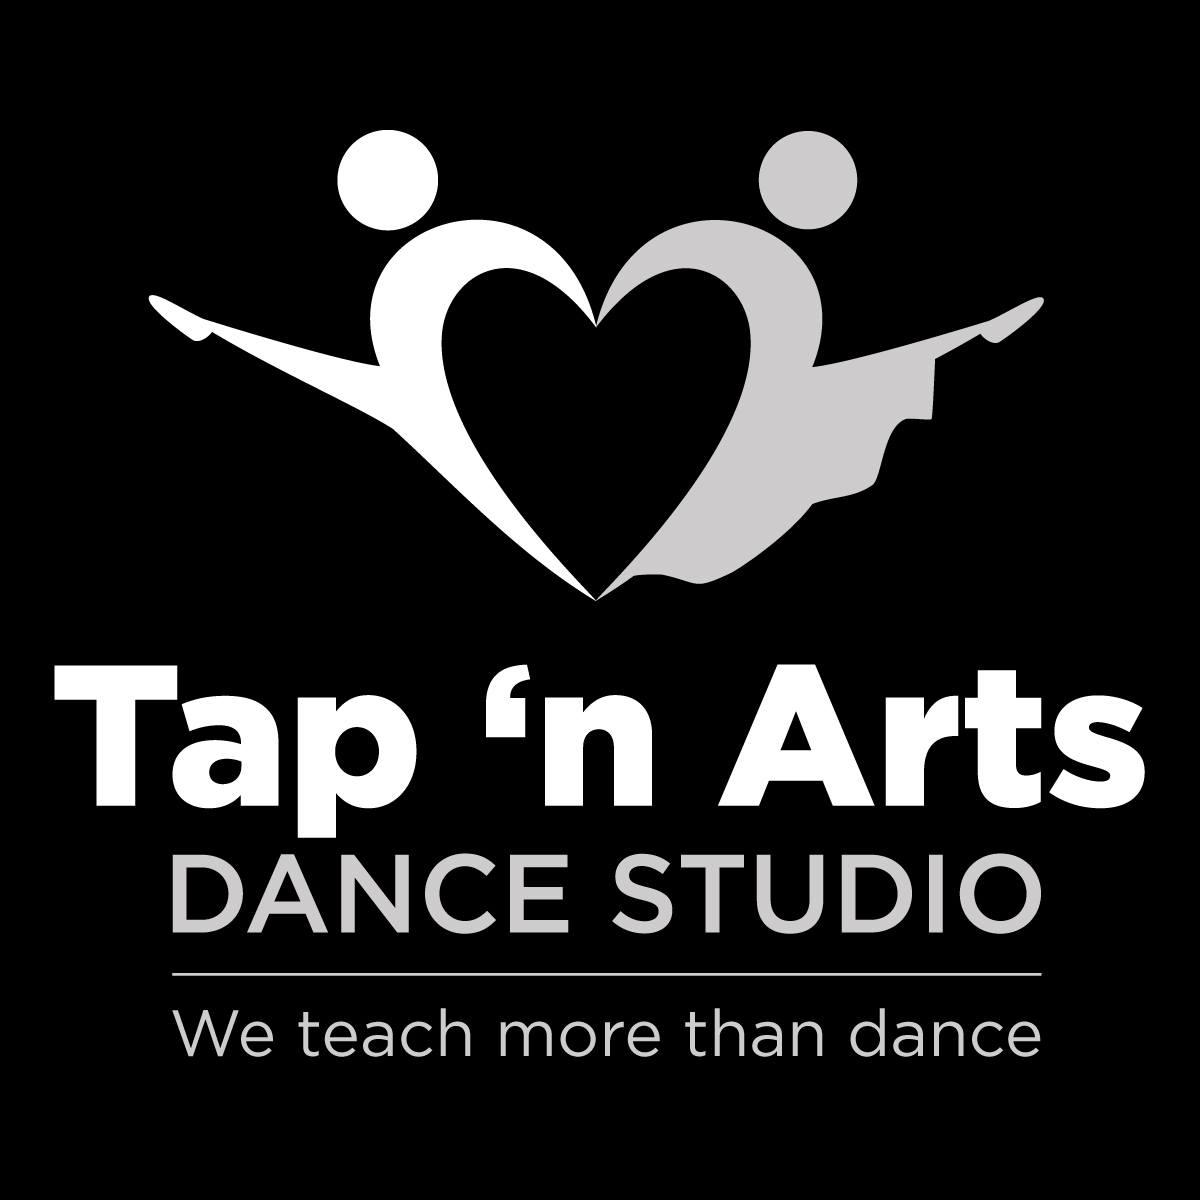 Tap 'n Arts Dance Studio of Harrisburg, PA image 0